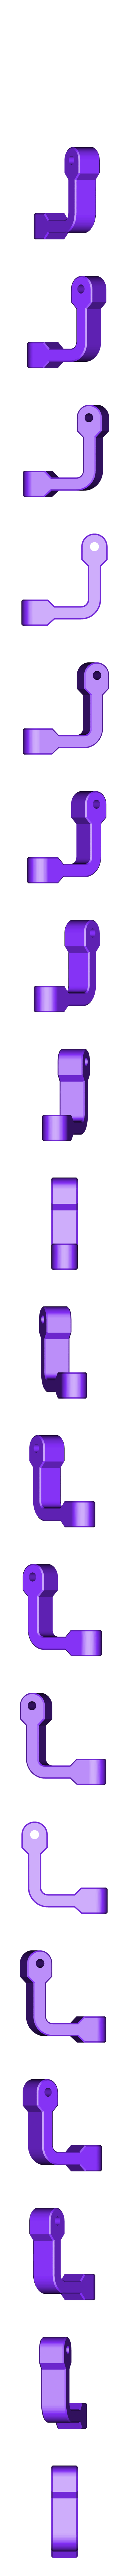 Scottoiler_swivel_3.stl Download free STL file Mounting Base Scottoiler eSystem • Template to 3D print, Harry_D60